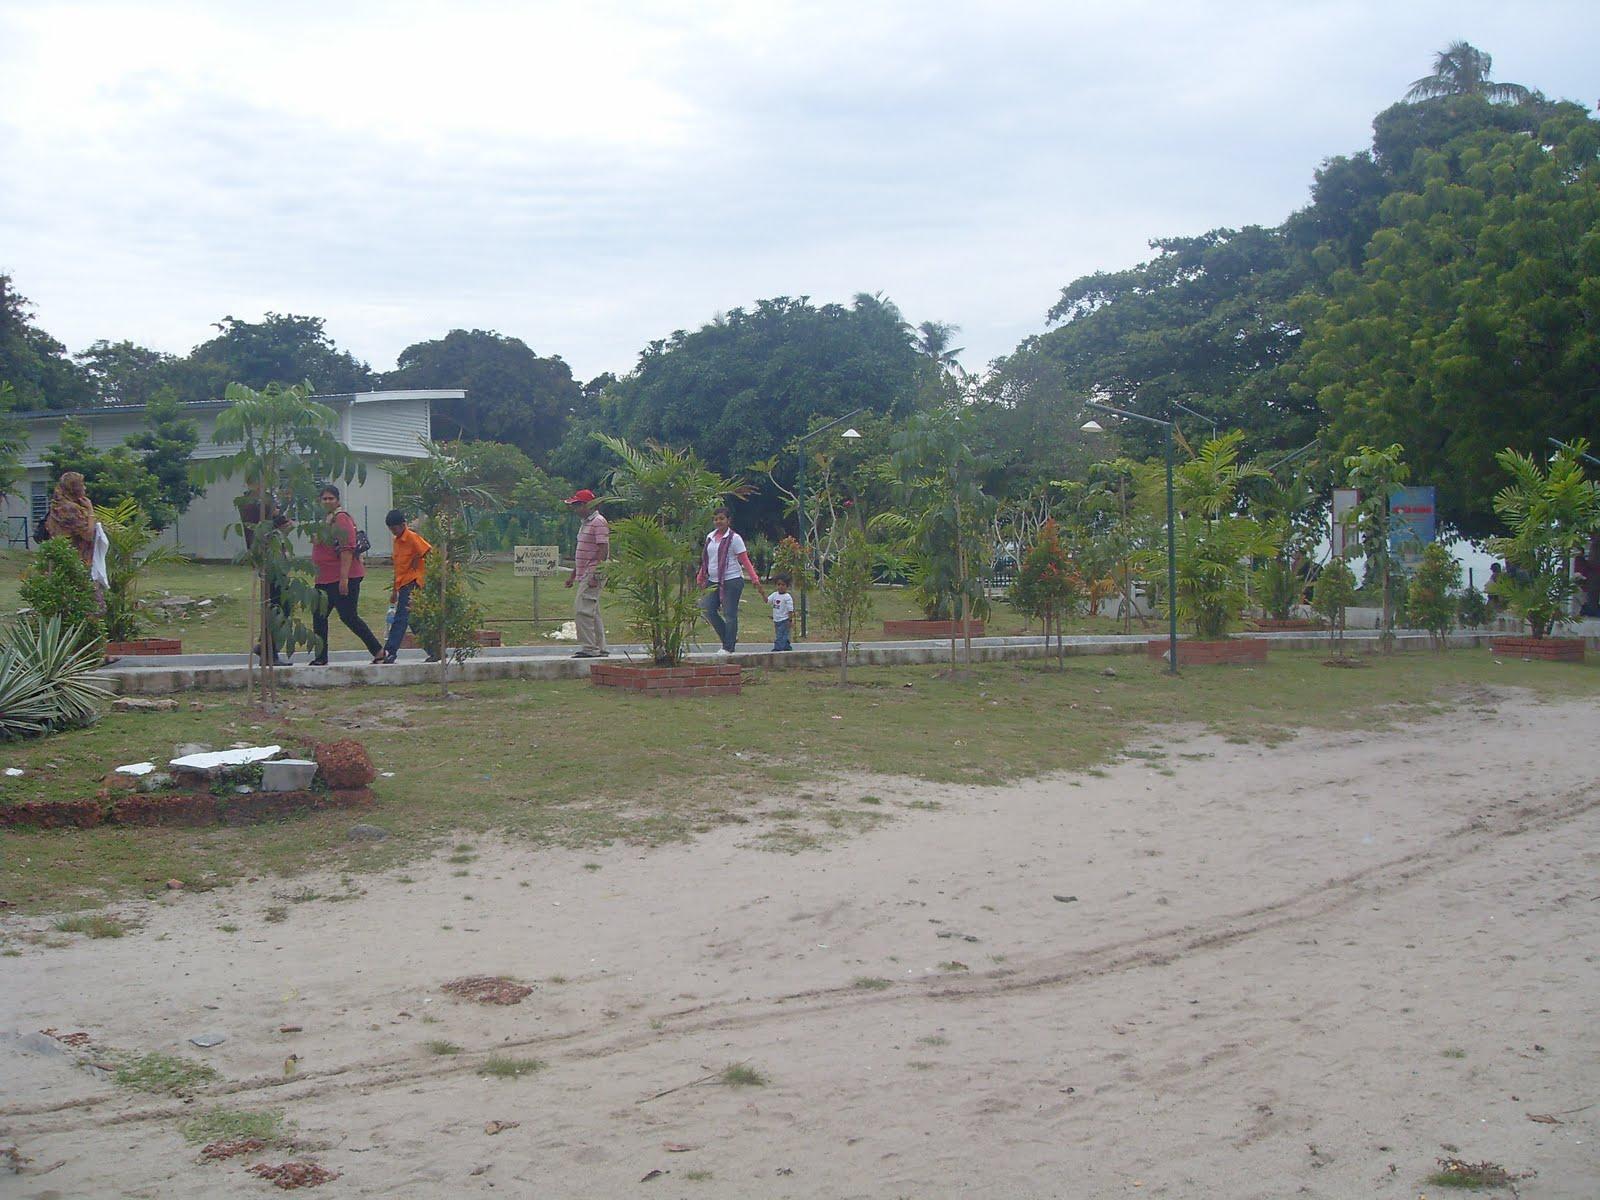 Angelray S Bloggie World Visit To Pulau Besar Malacca